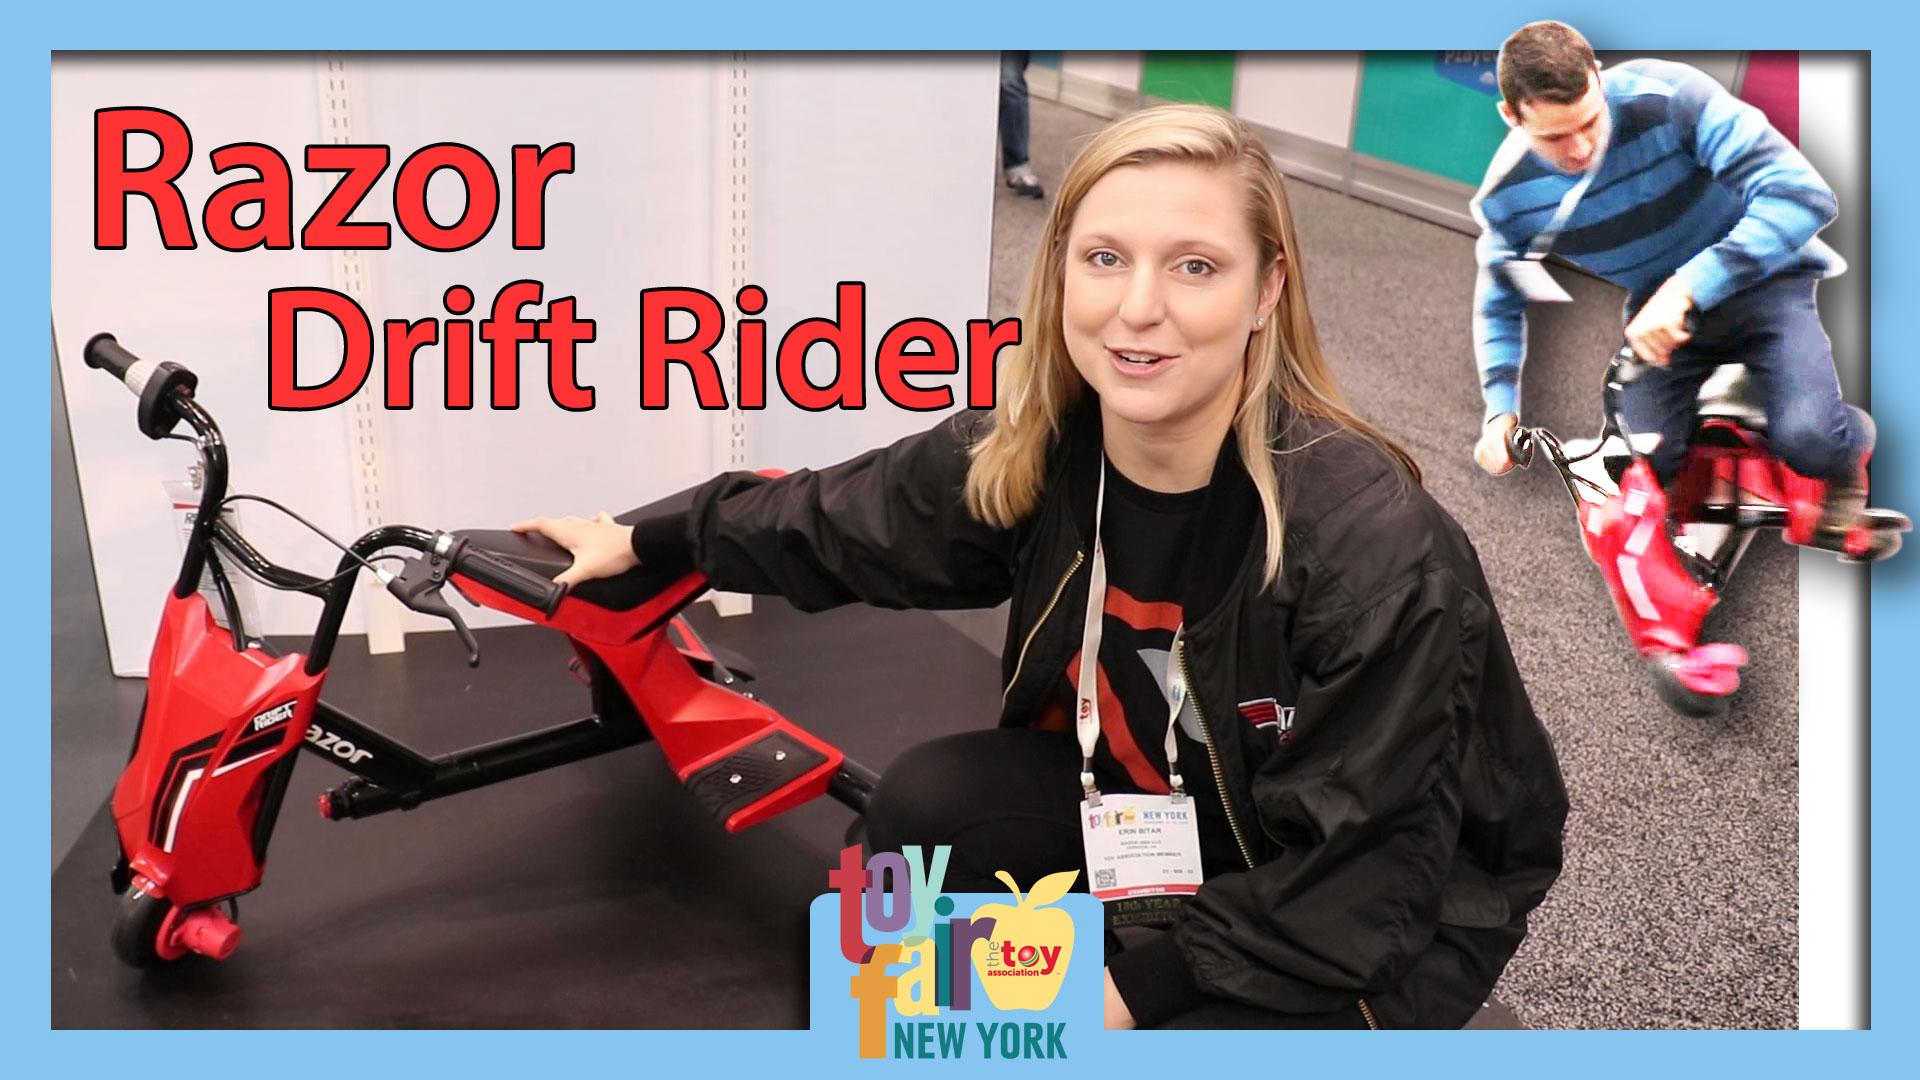 Razor Drift Rider